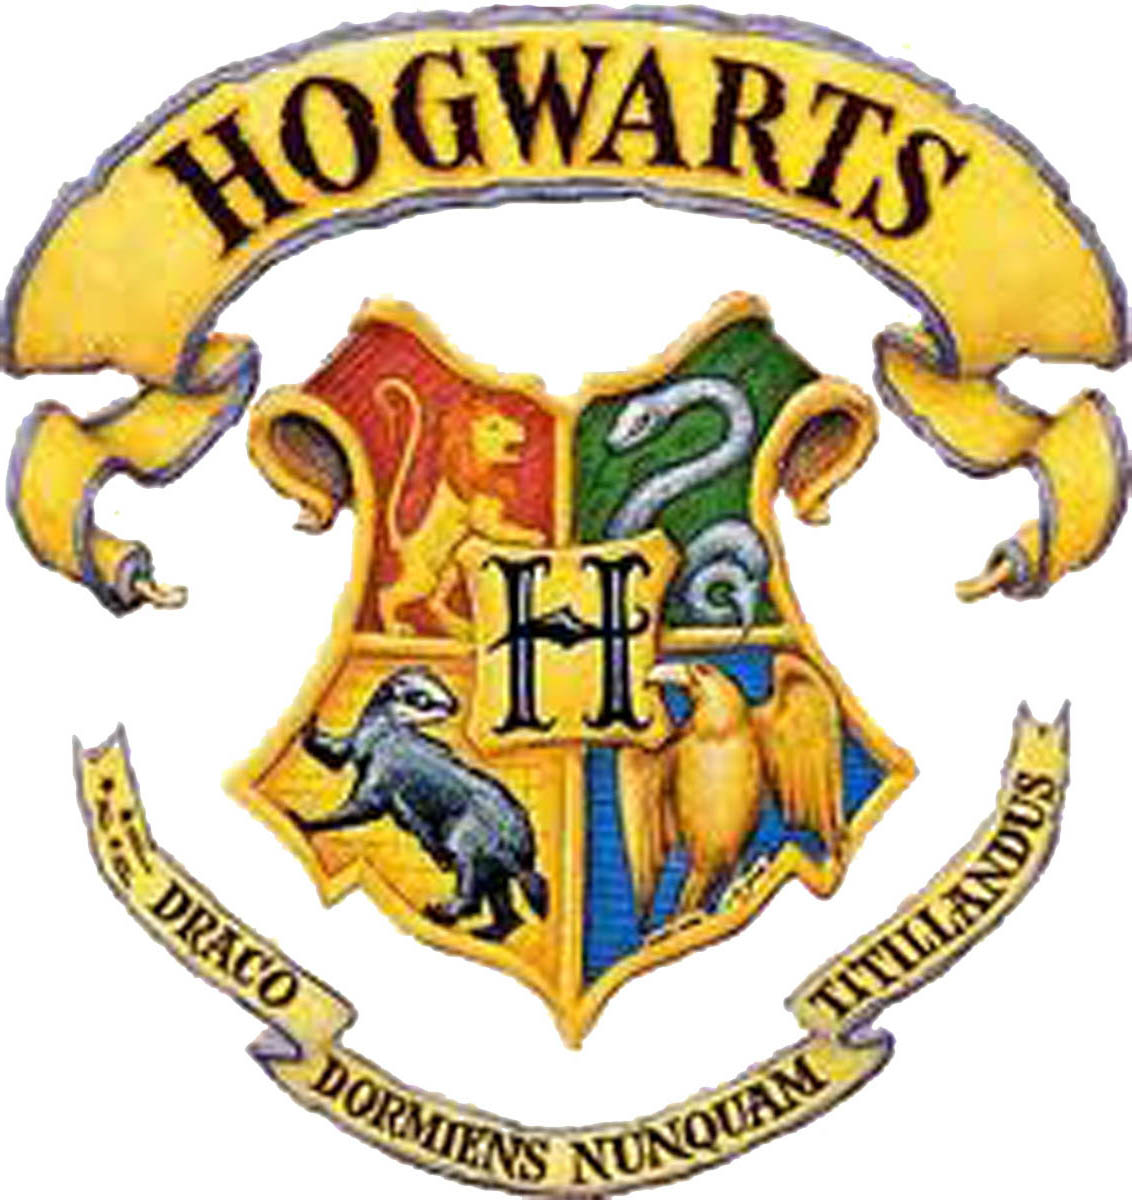 Harry potter clipart #2